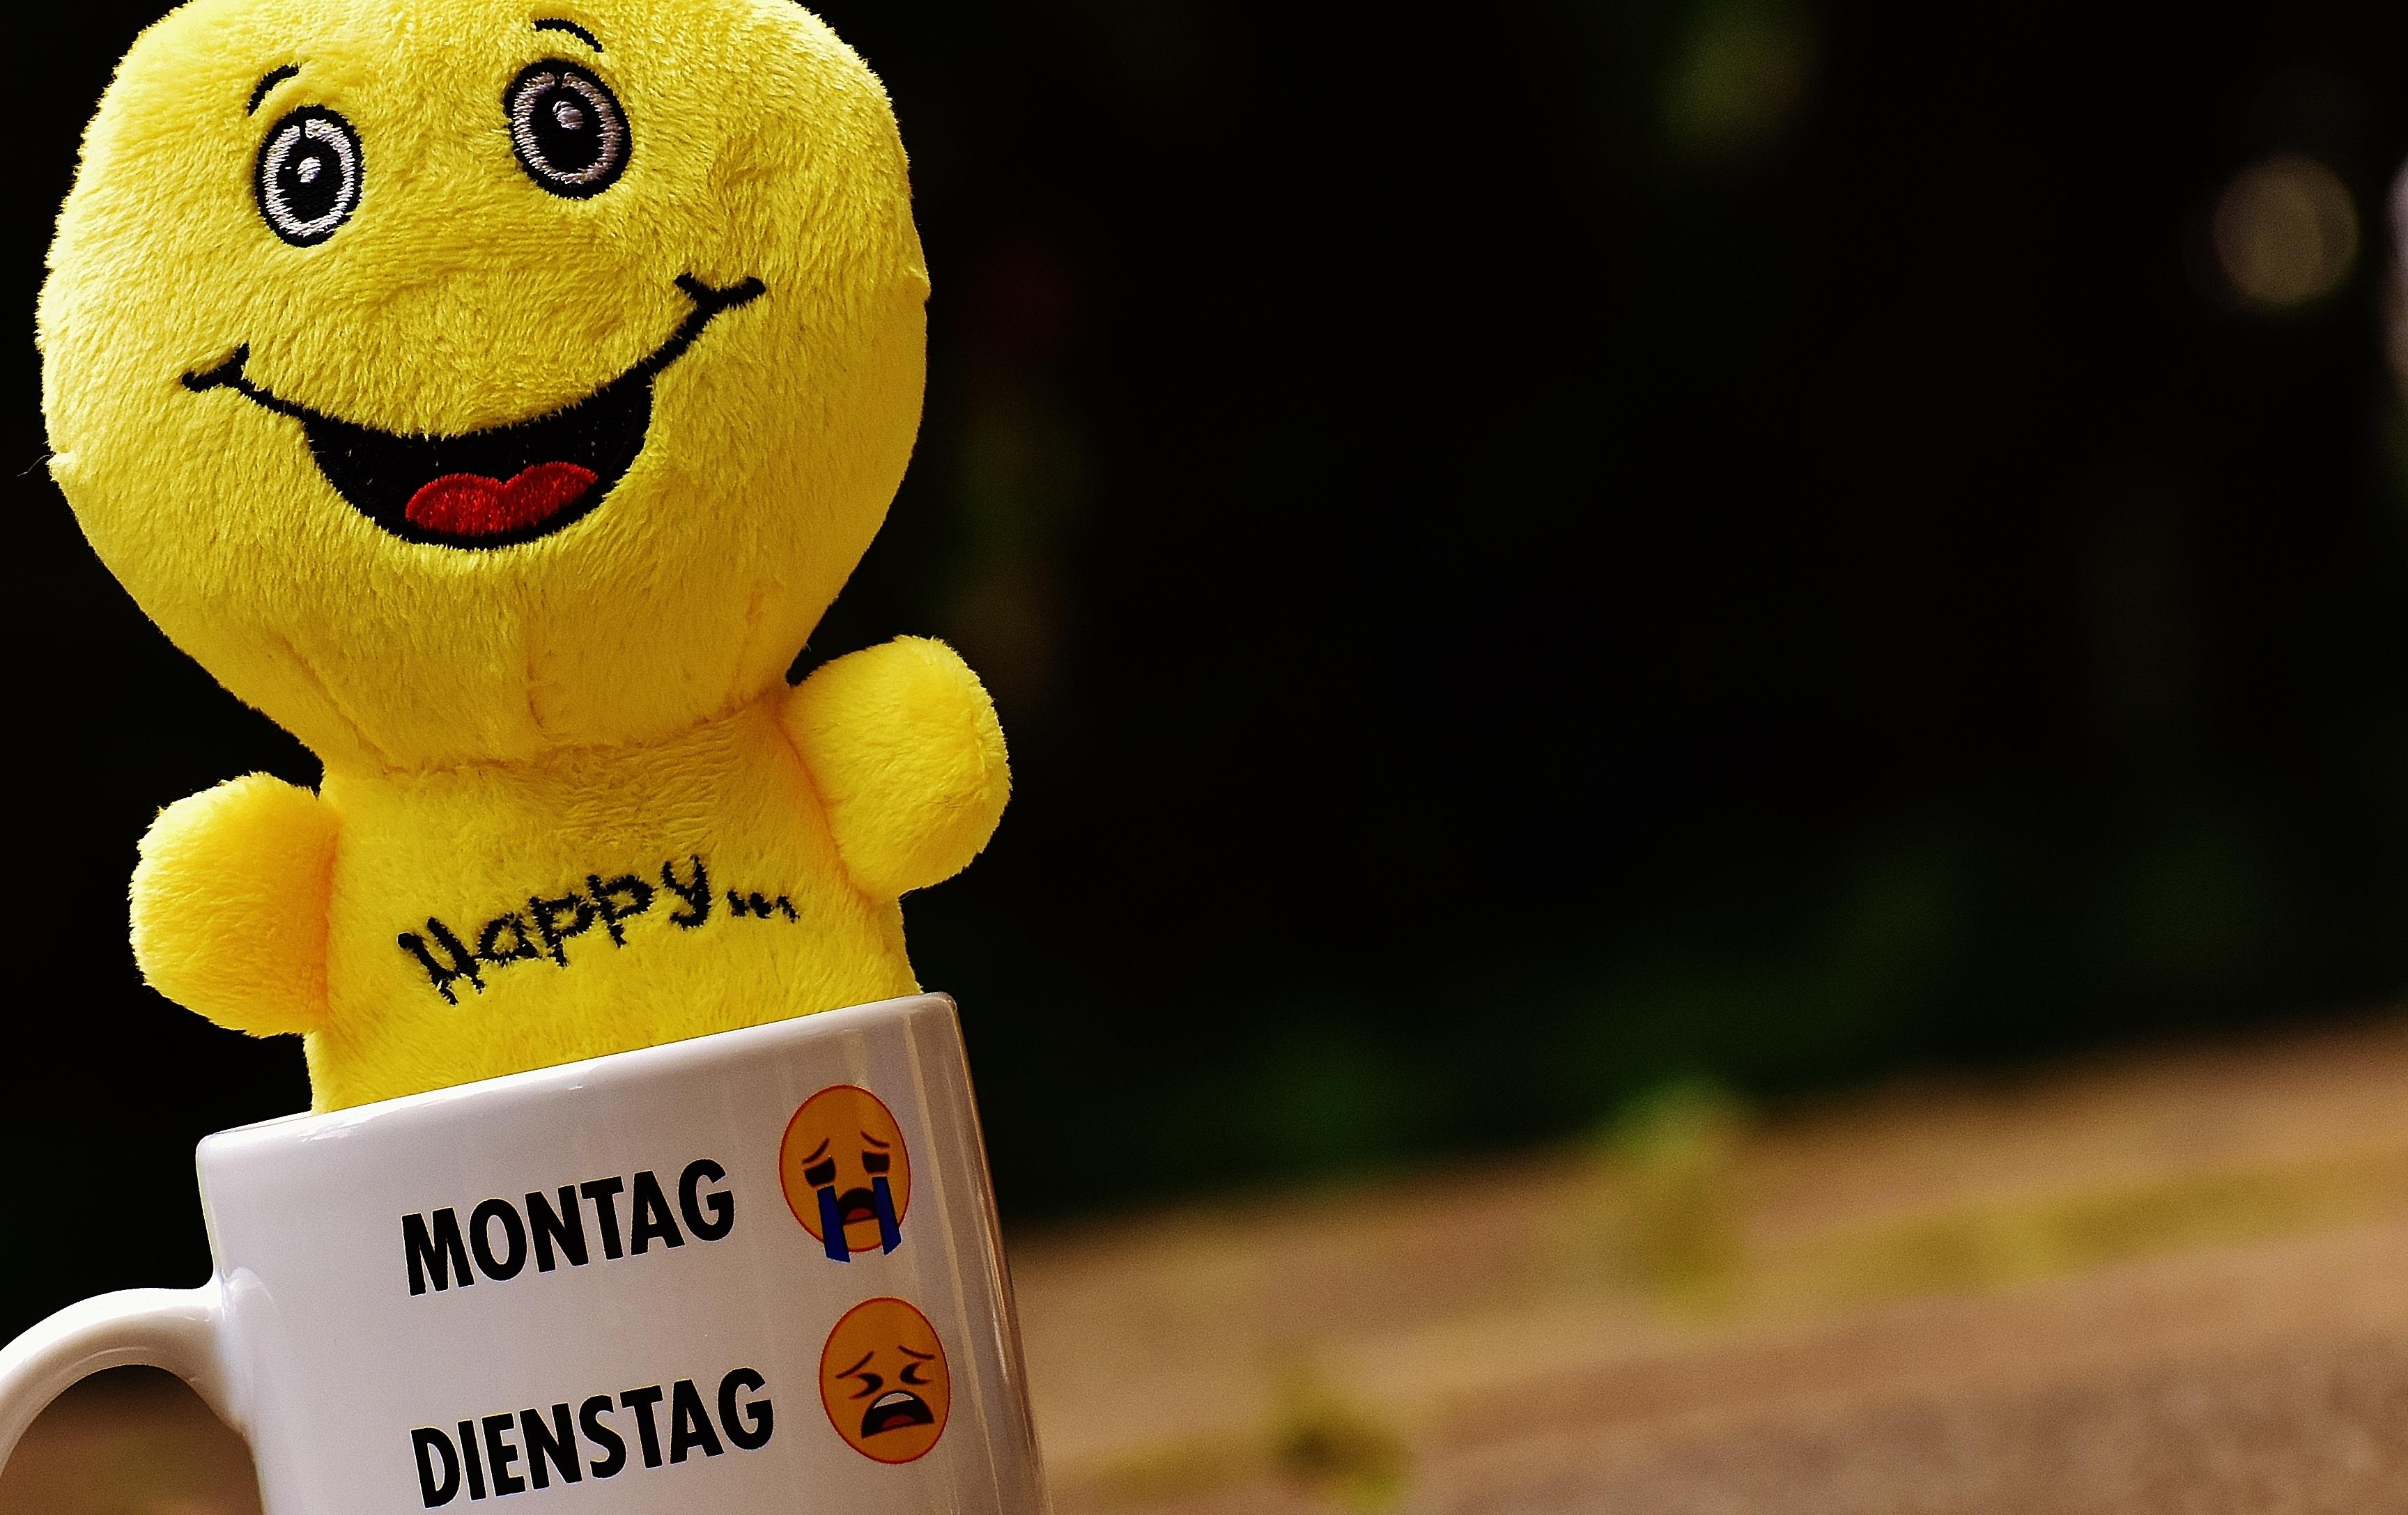 Smile Toys And Joys : Banco de imagens copo cor amarelo brinquedo sorrir